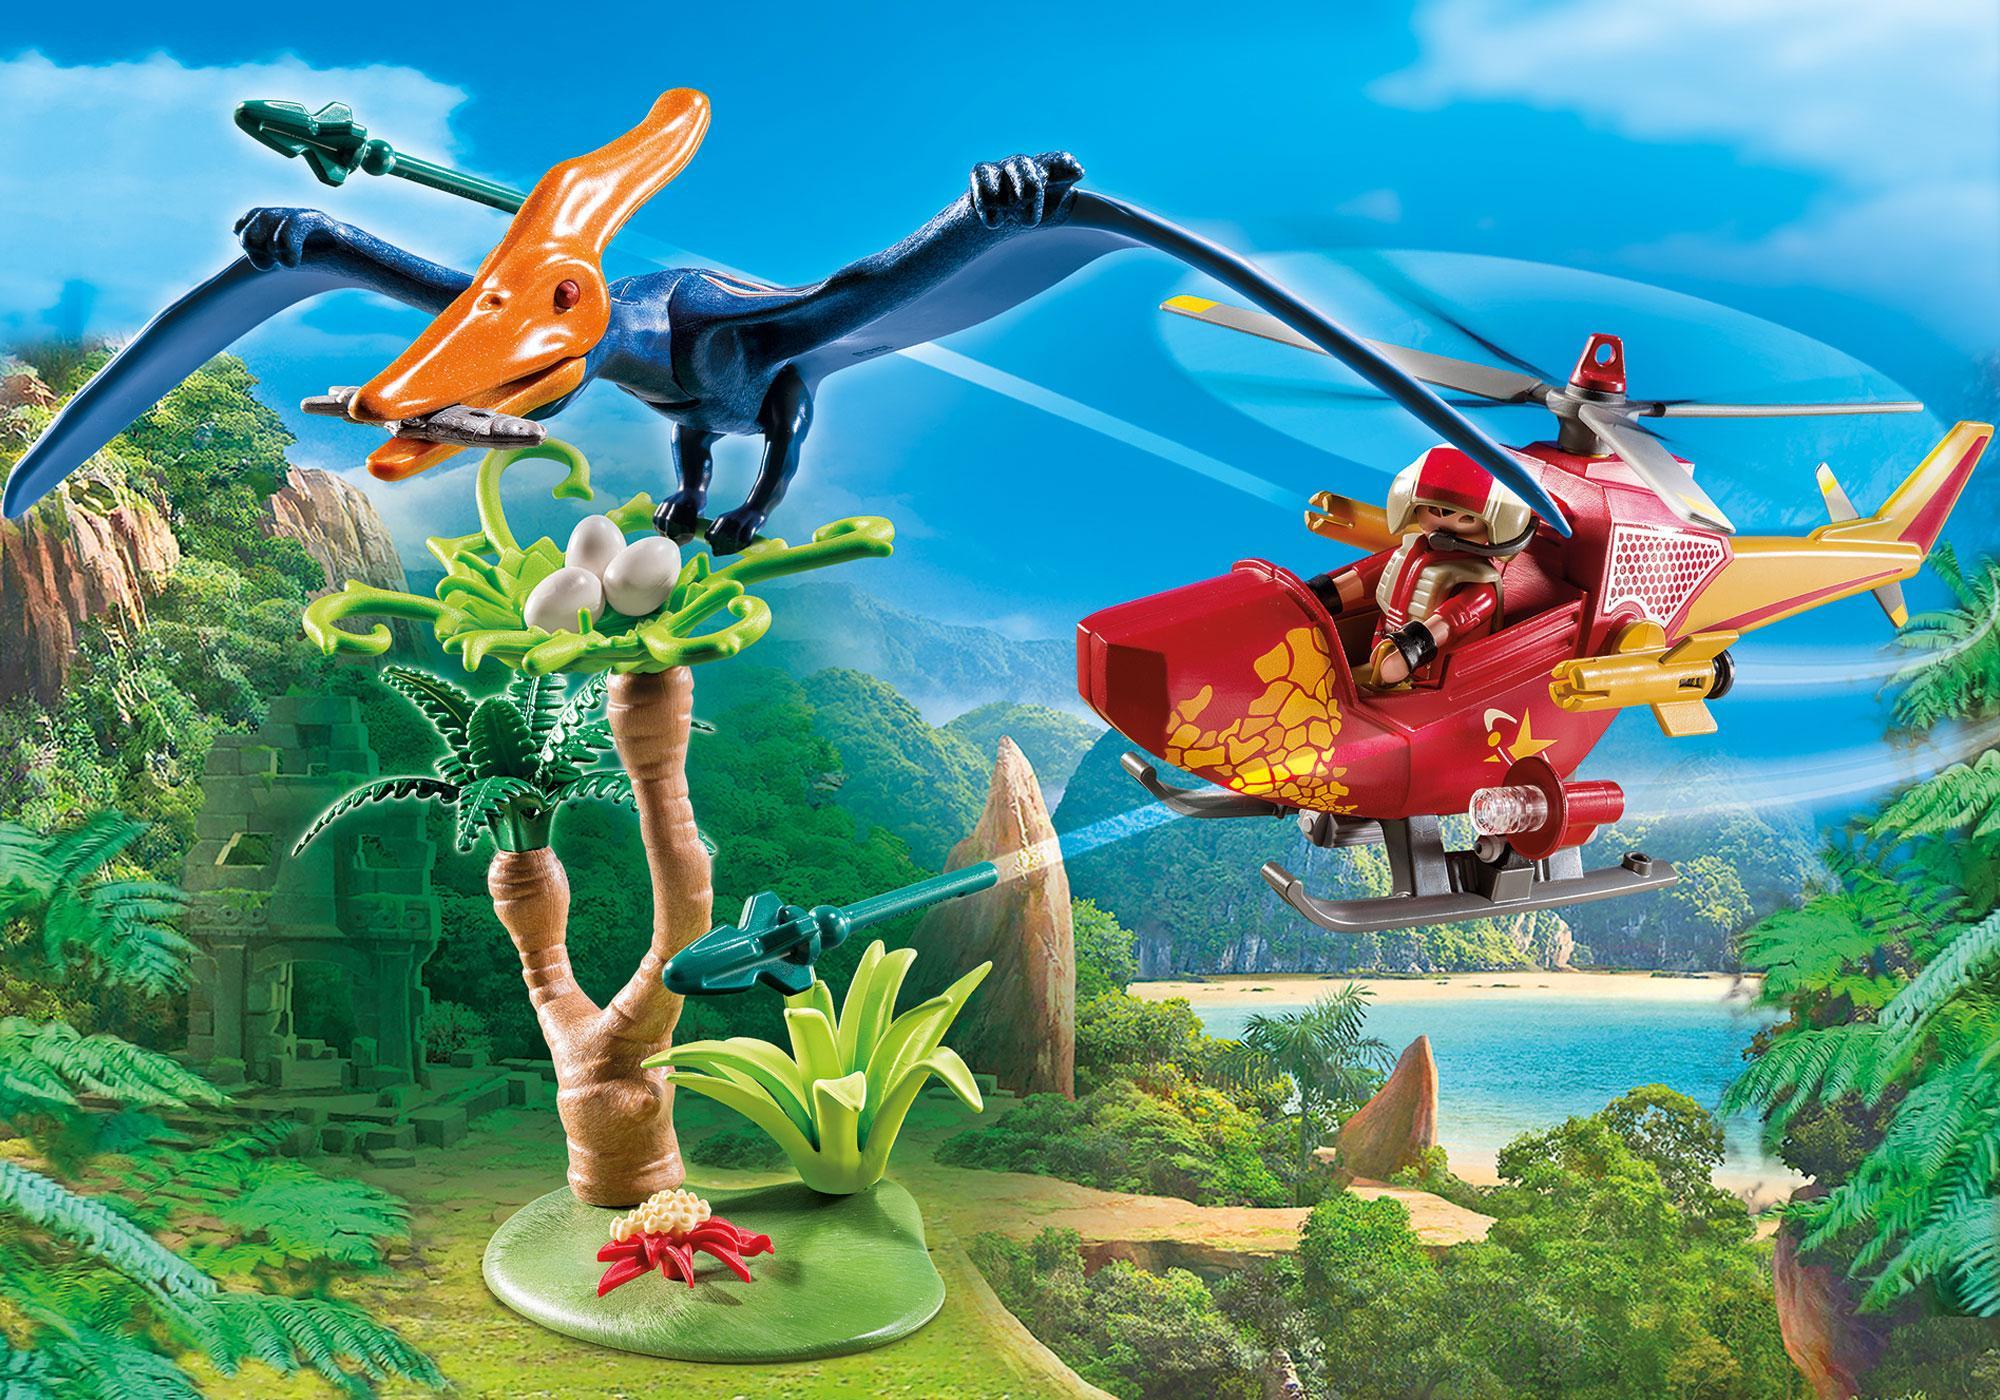 http://media.playmobil.com/i/playmobil/9430_product_detail/Helicóptero con Pterosaurio